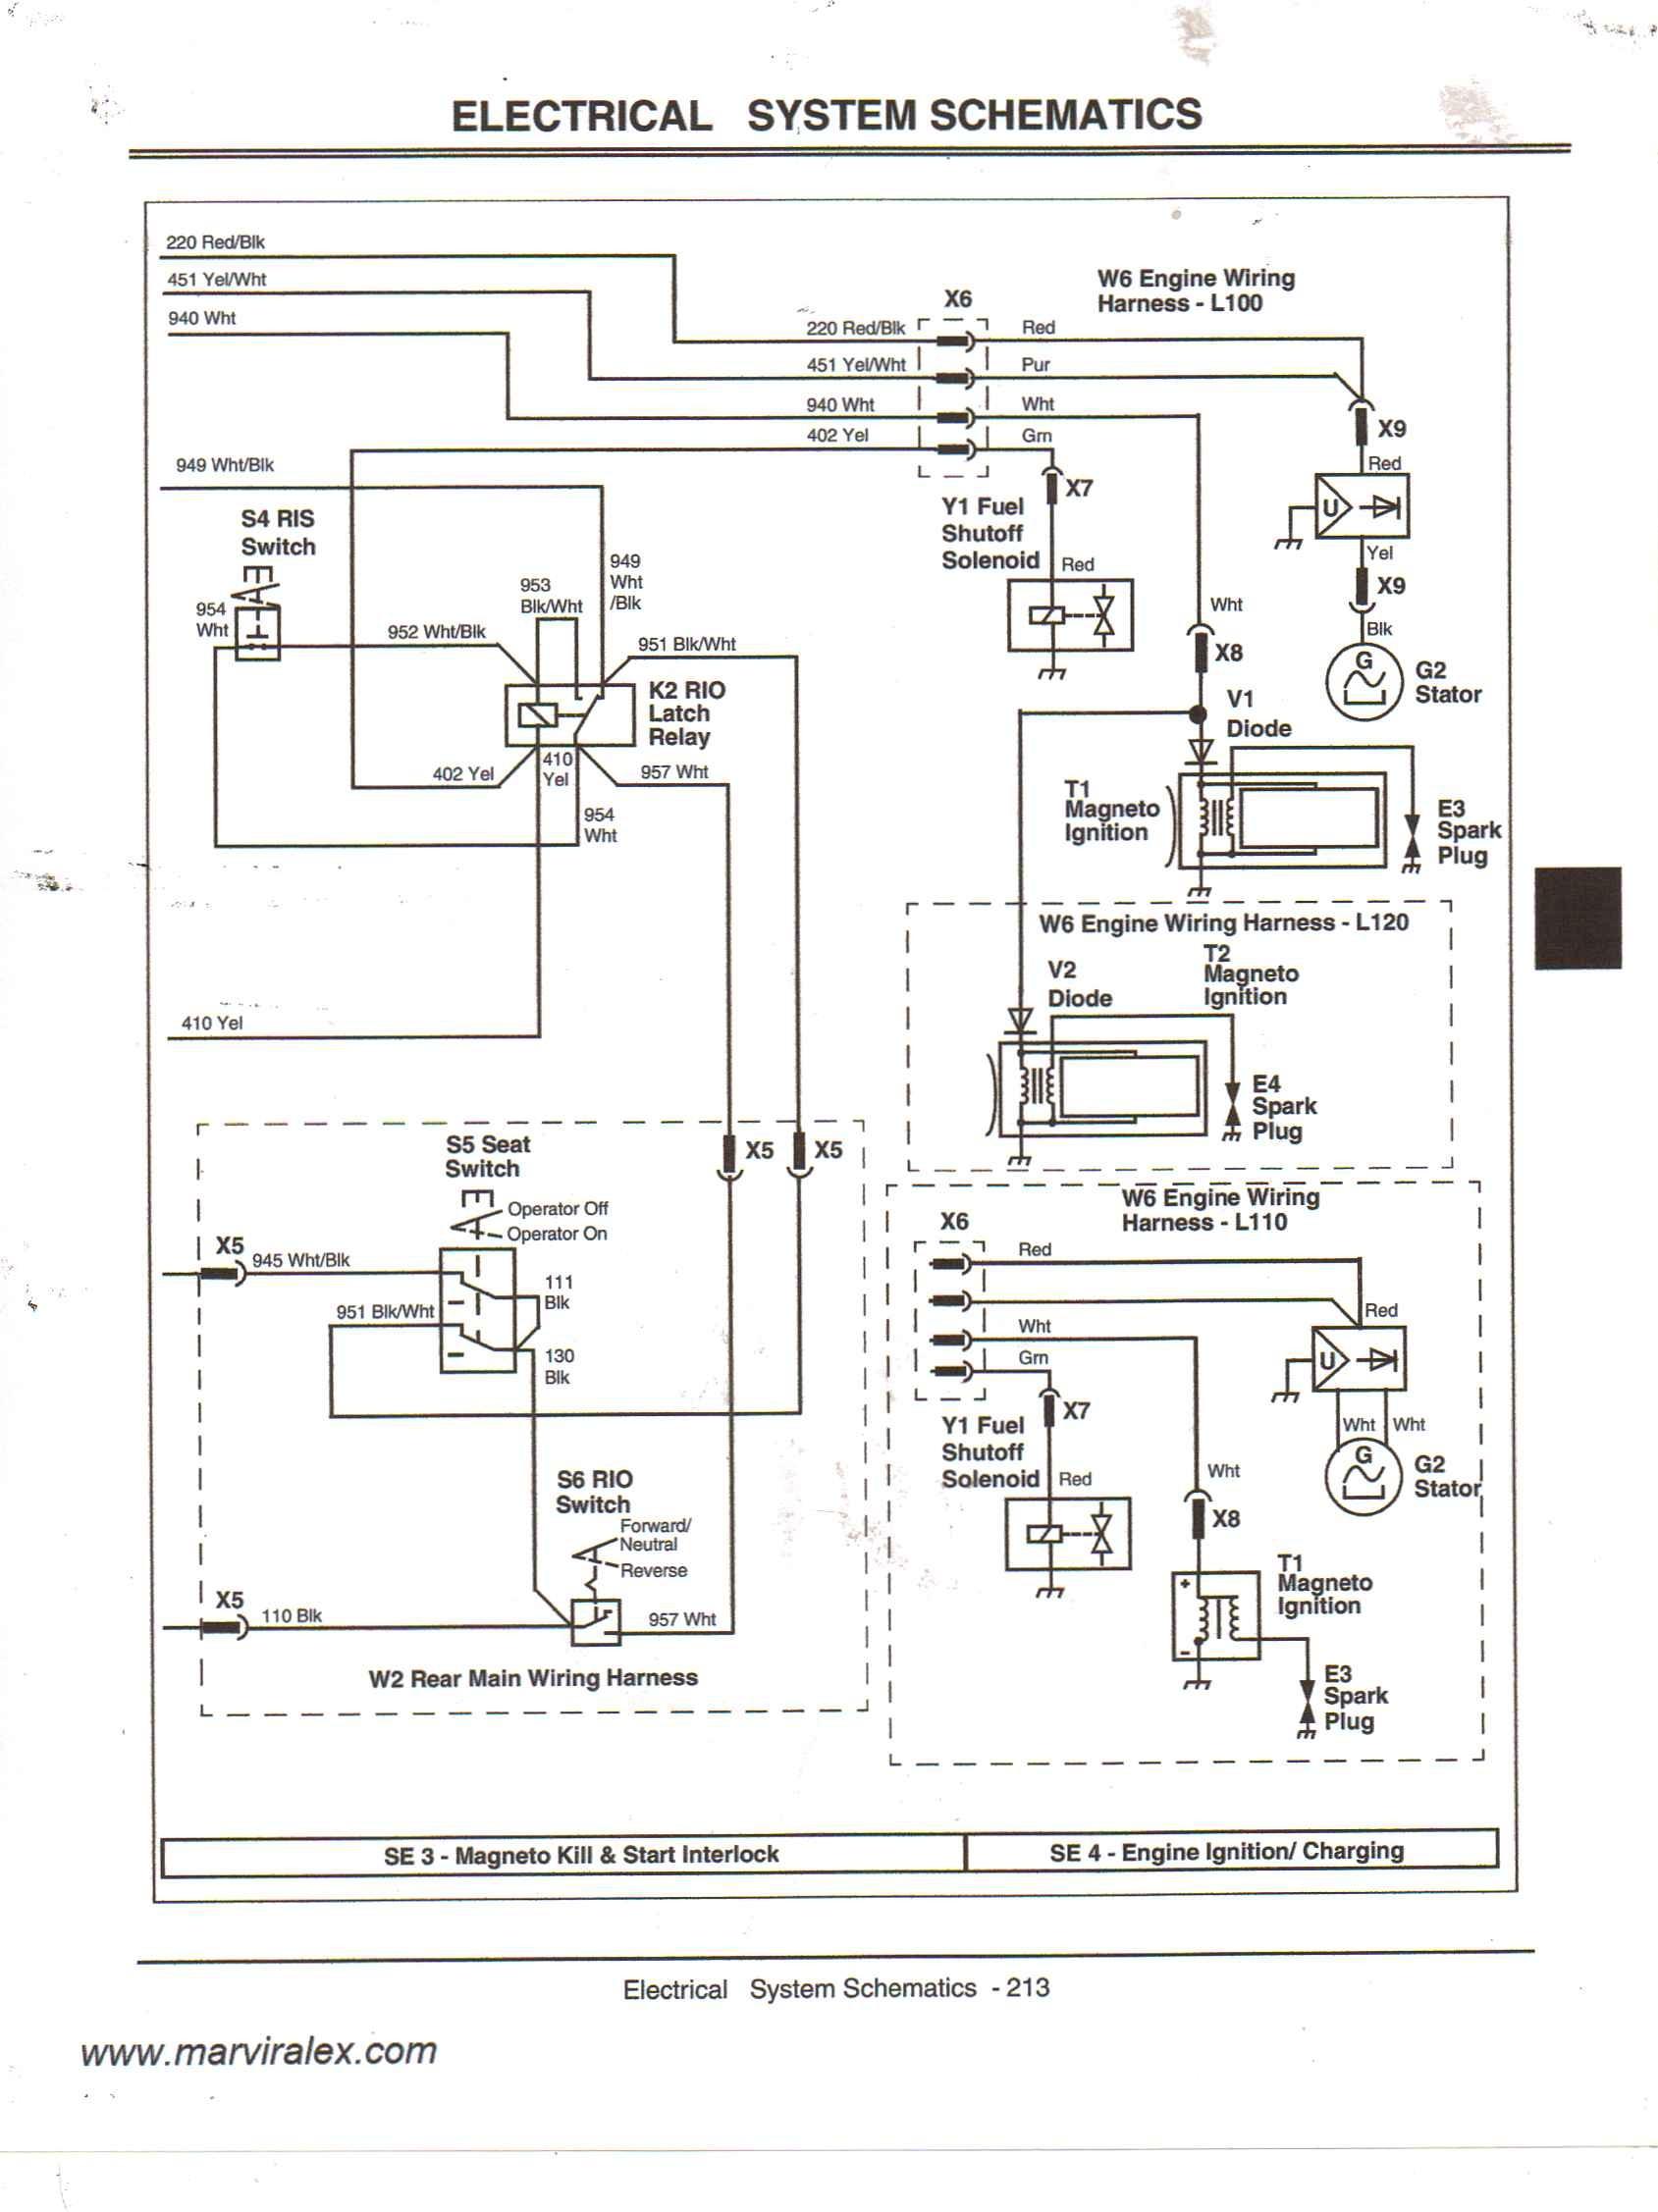 john deere 6420 wiring diagram free download wiring diagram xwiaw rh xwiaw us john deere 6320 wiring diagram john deere 6320 electrical schematic